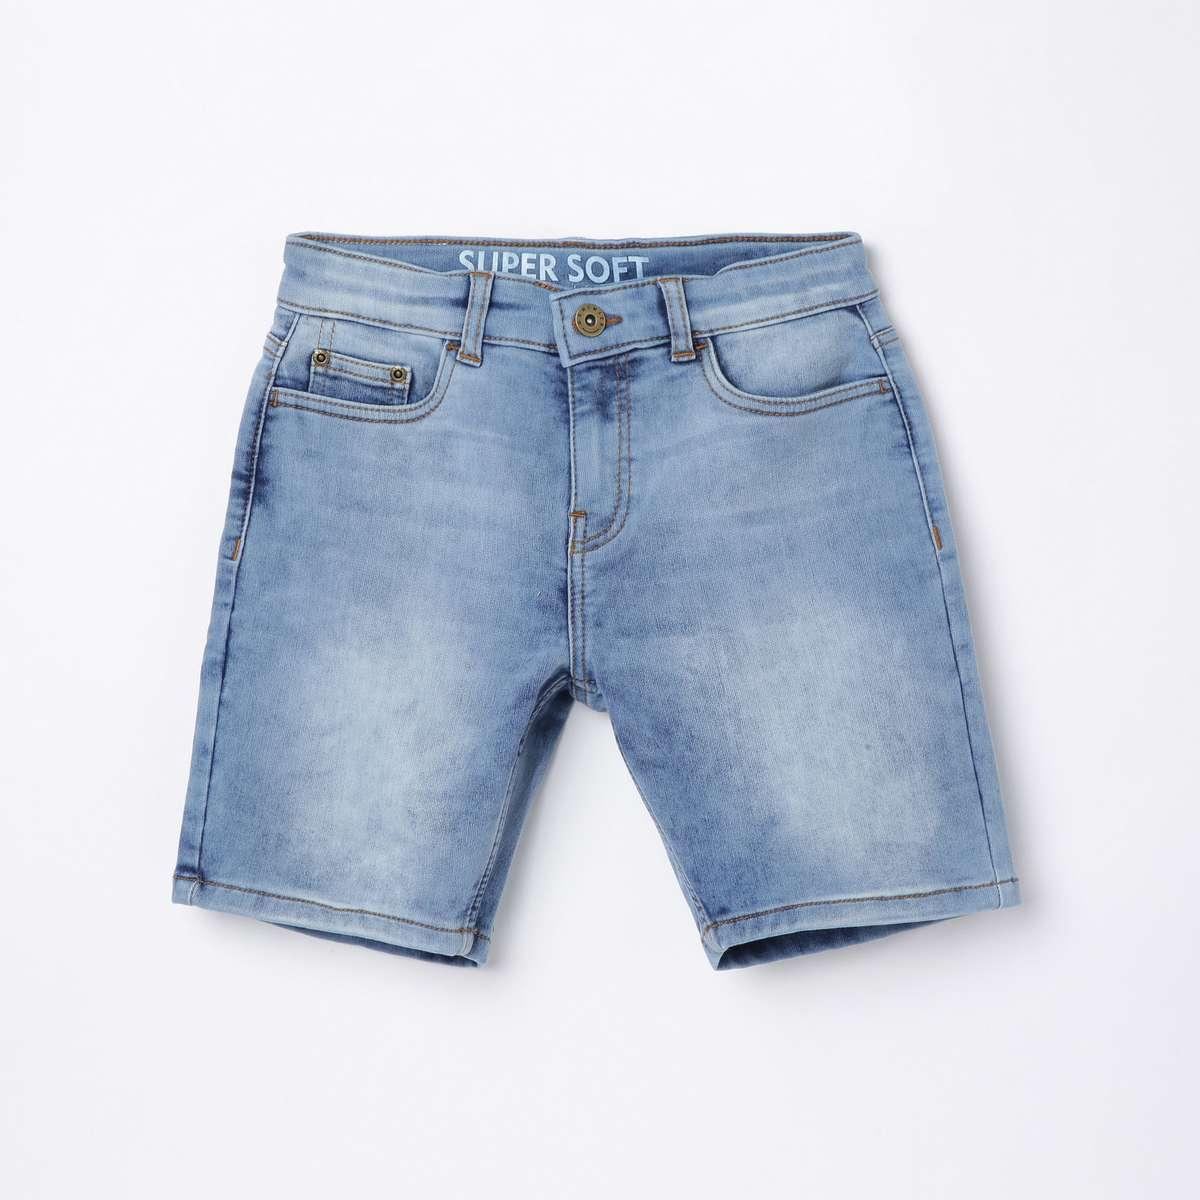 5.DENIMIZE Boys Solid Denim Shorts